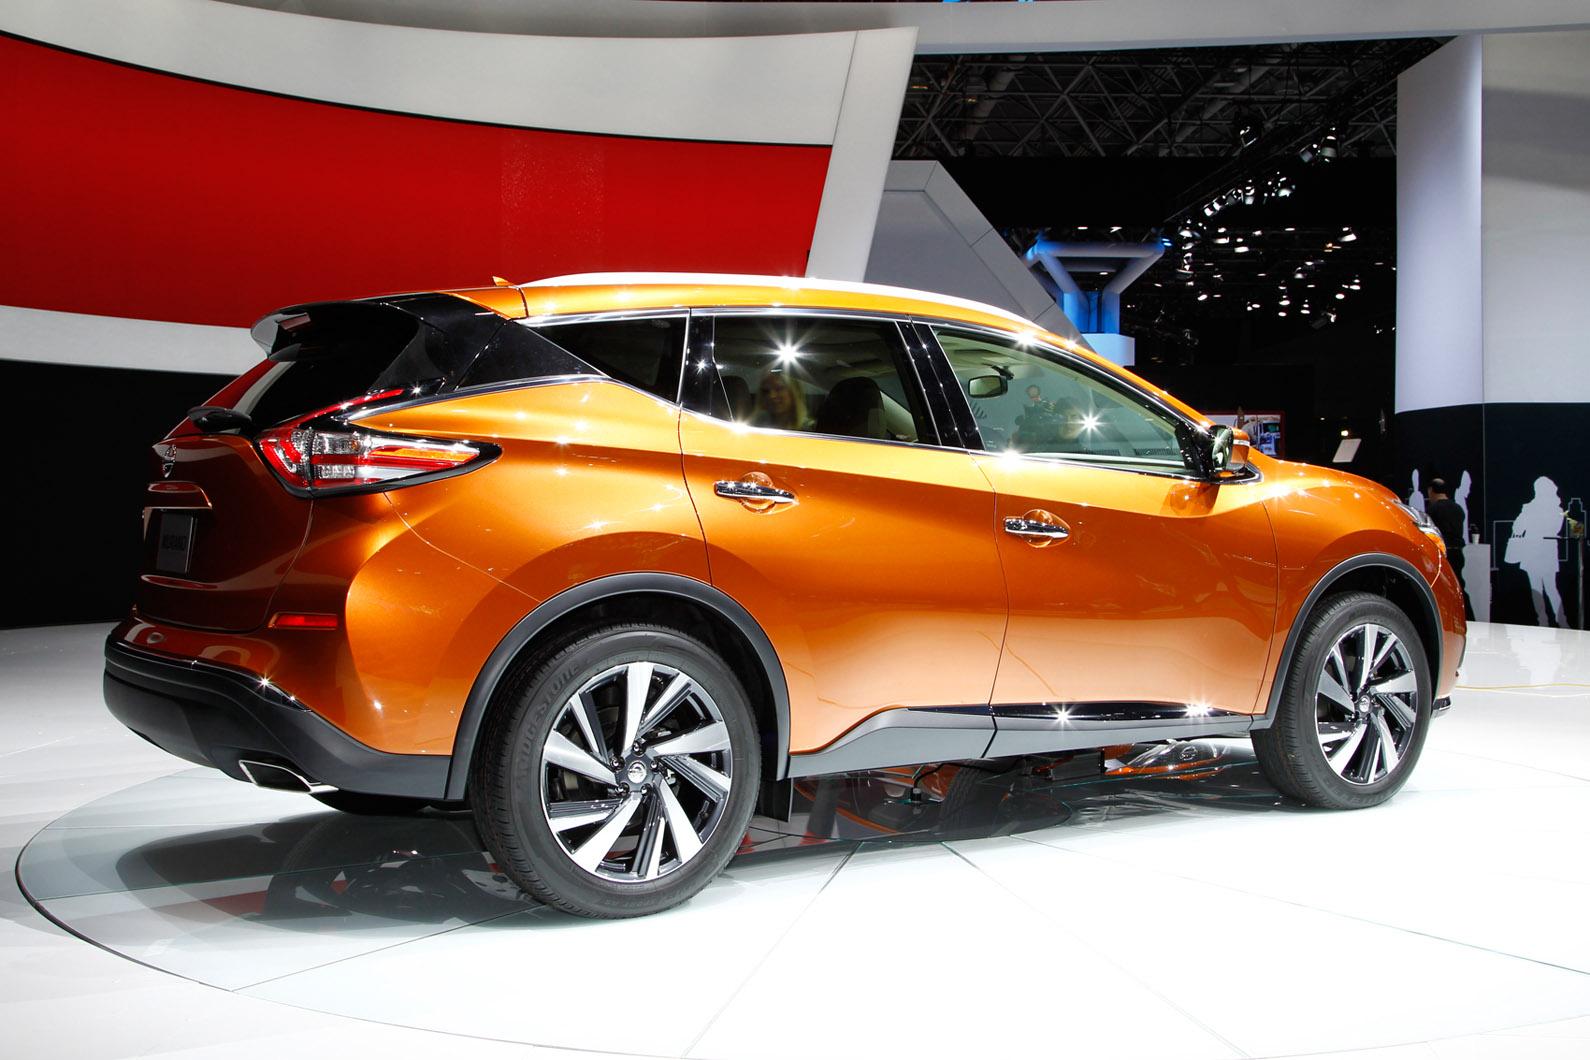 2014 - [Nissan] Murano III - Page 3 Ny-batch-1-054_0